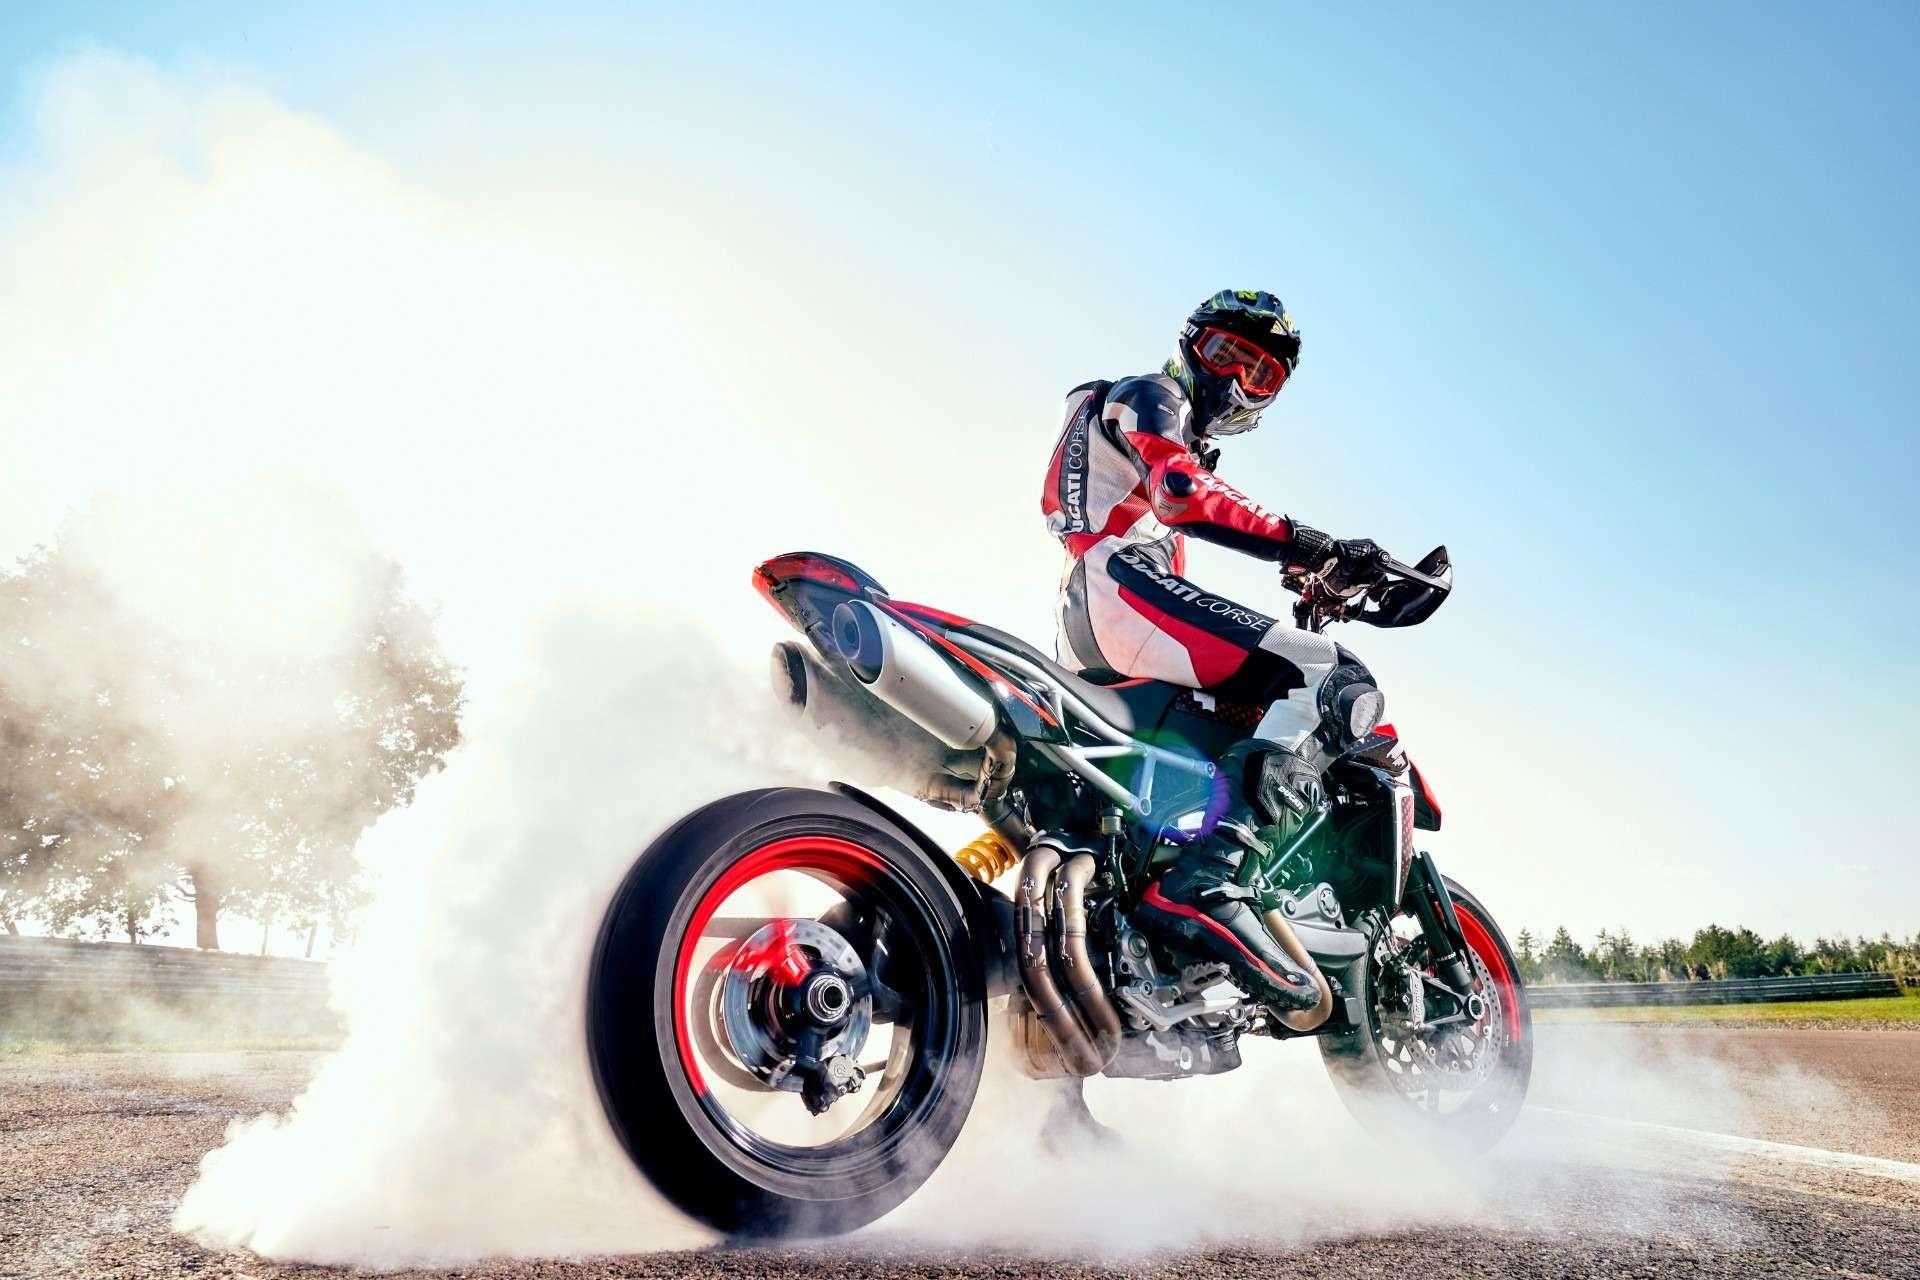 Ducati показала мотоцикл Hypermotard вварианте 950RVE— фото 1141067